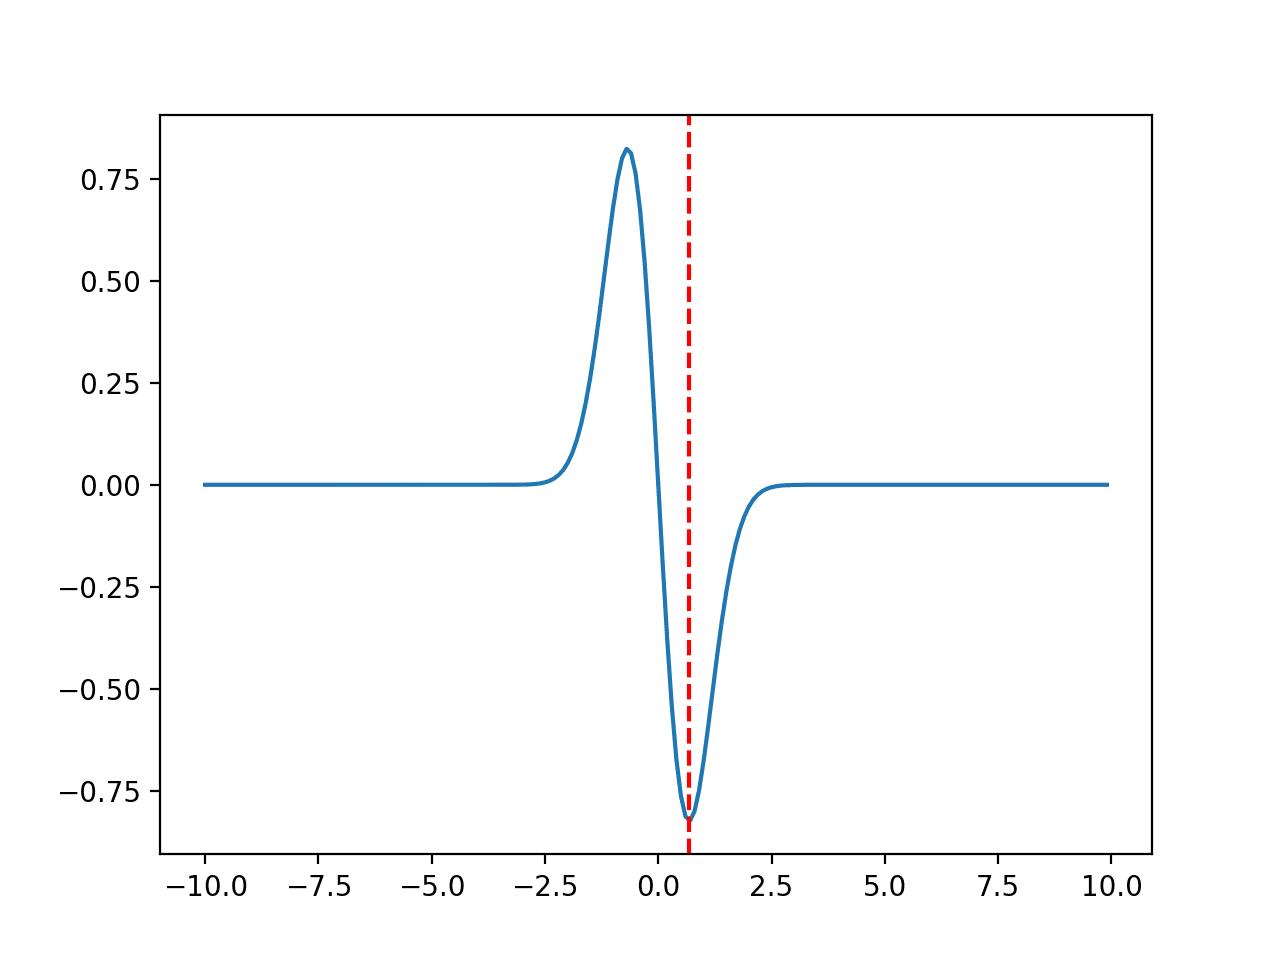 Line Plot of Non-Convex Unimodal Optimization Function